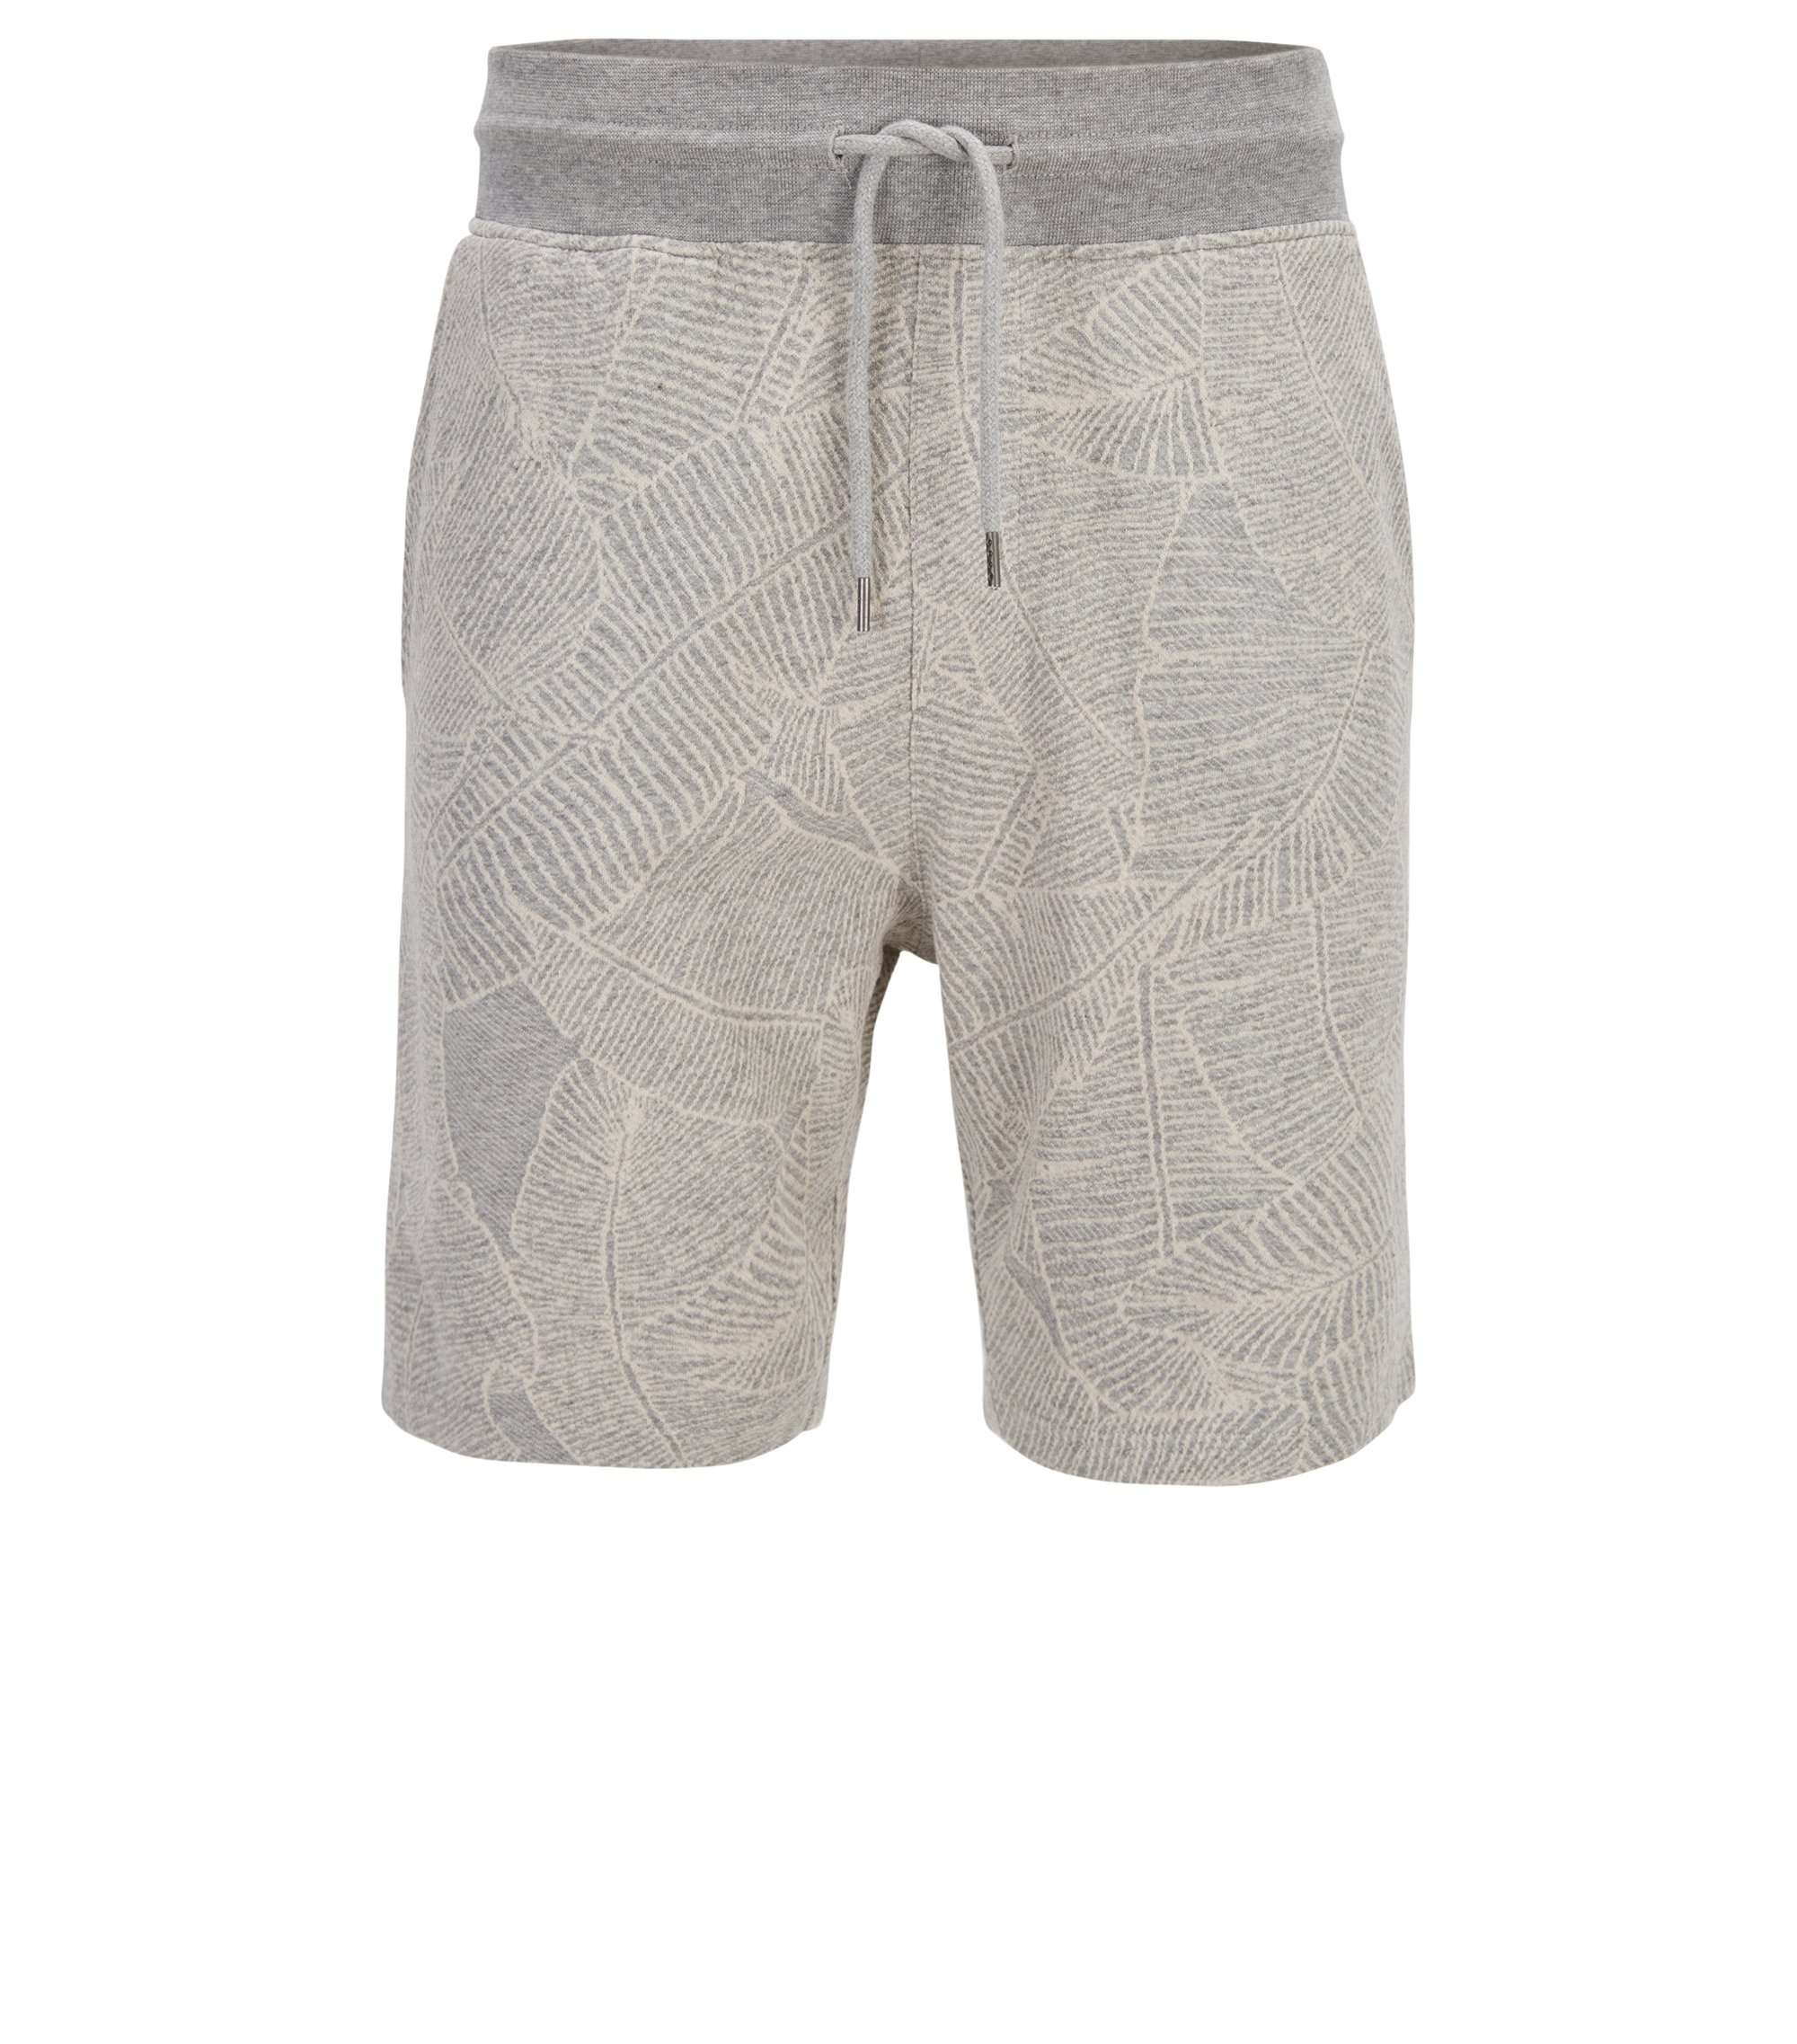 Gemusterte Shorts aus garngefärbter Baumwolle, Grau